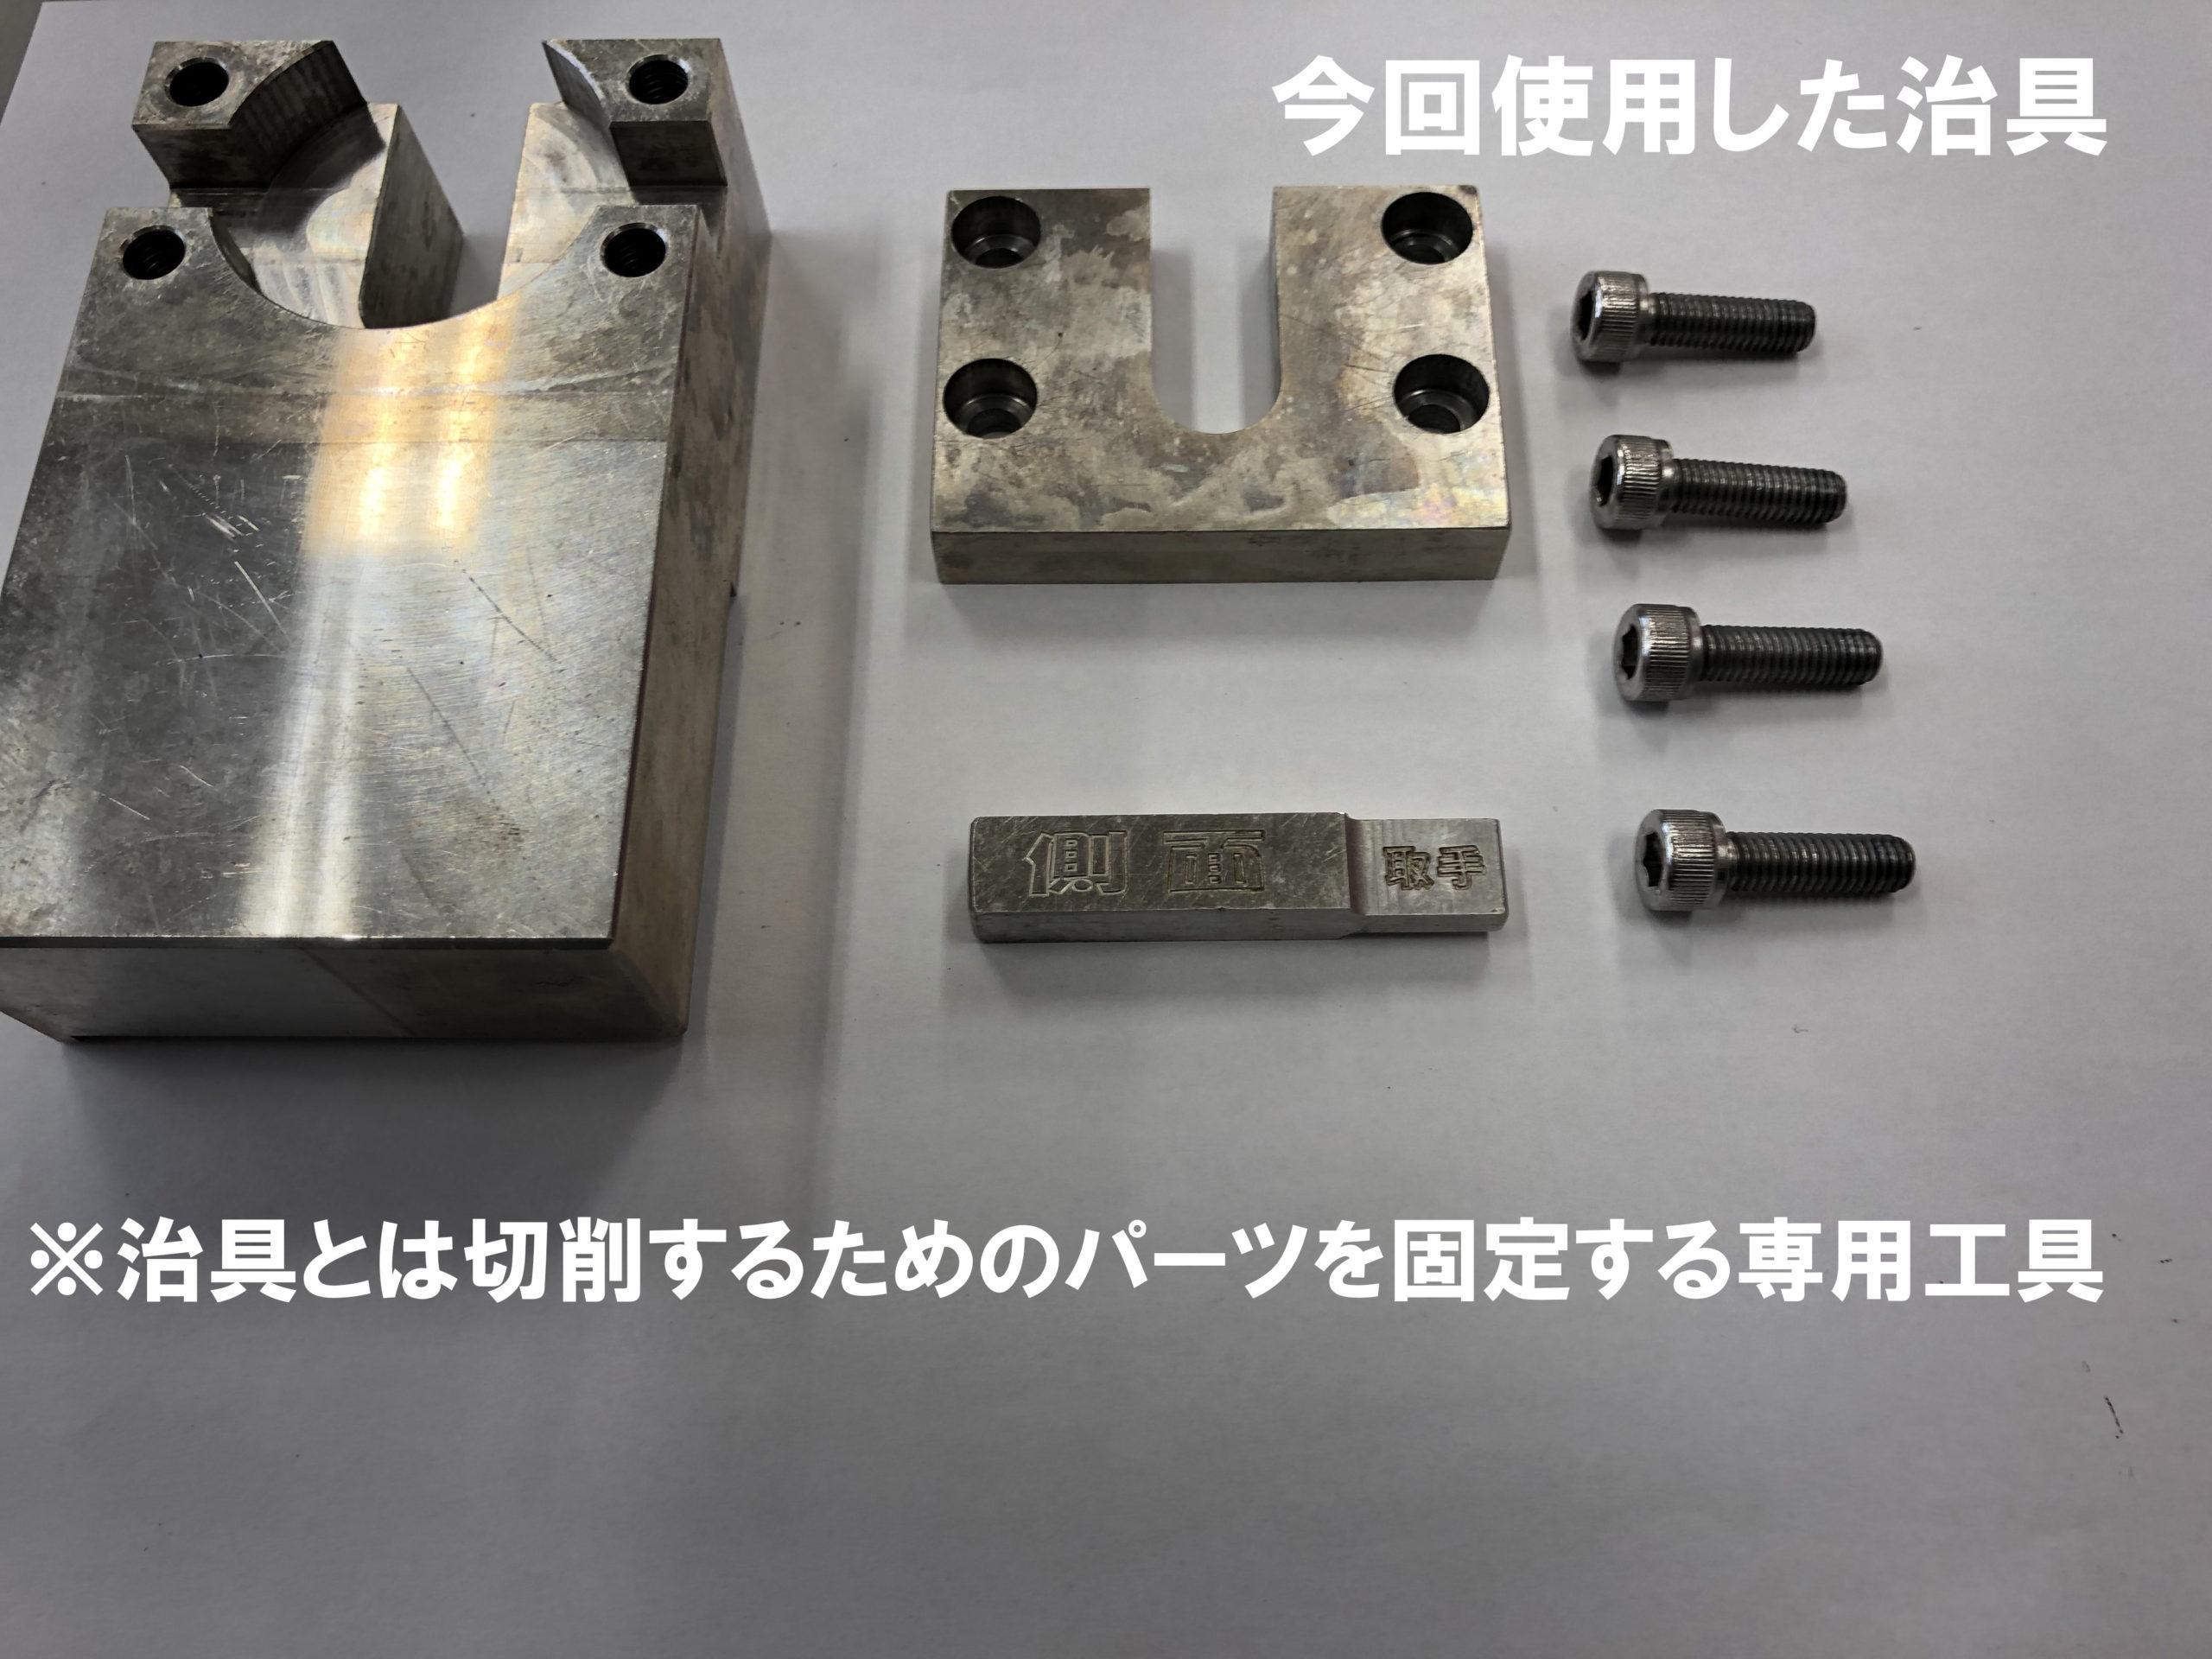 D.球体パズル治具(自動車機械科)-scaled.jpg